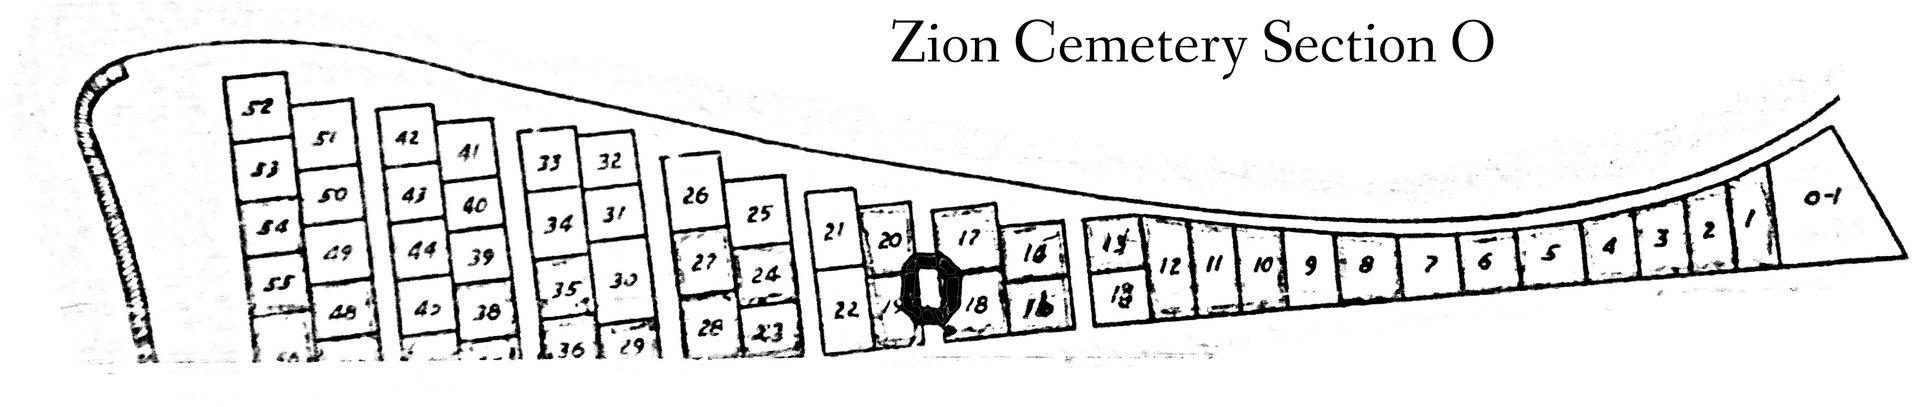 map-section-q.jpg